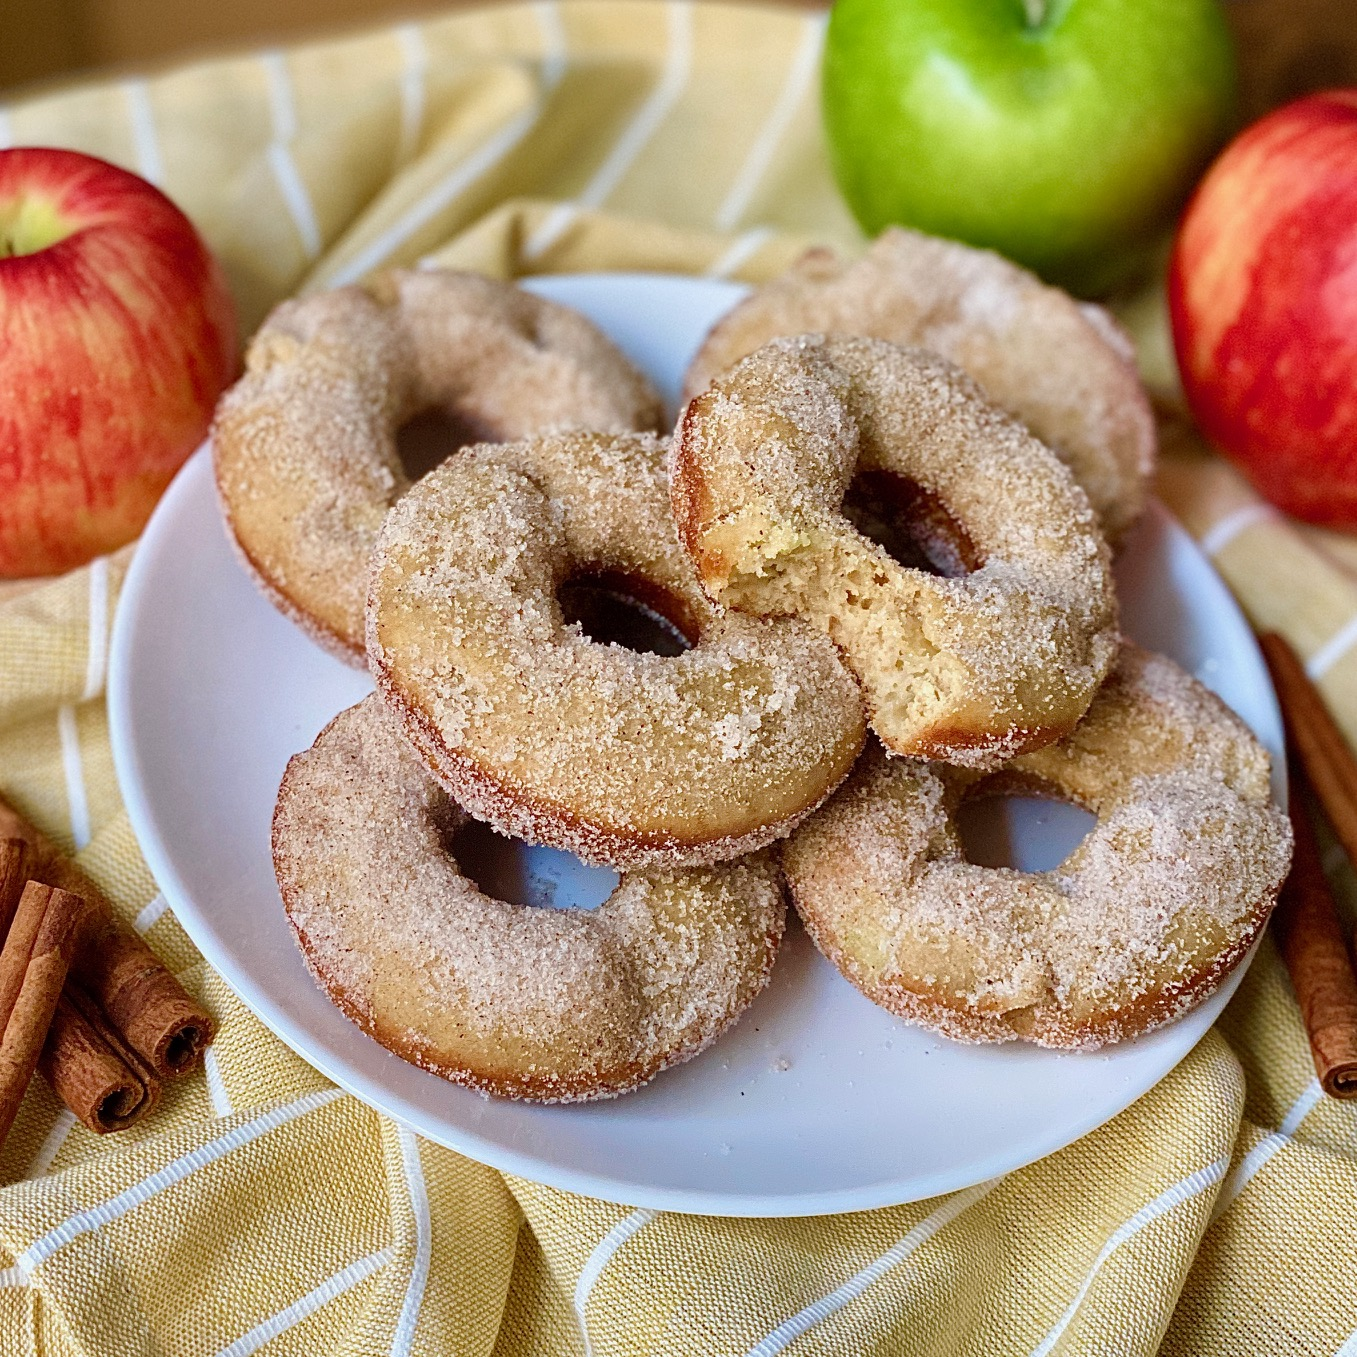 healthier apple cider donuts